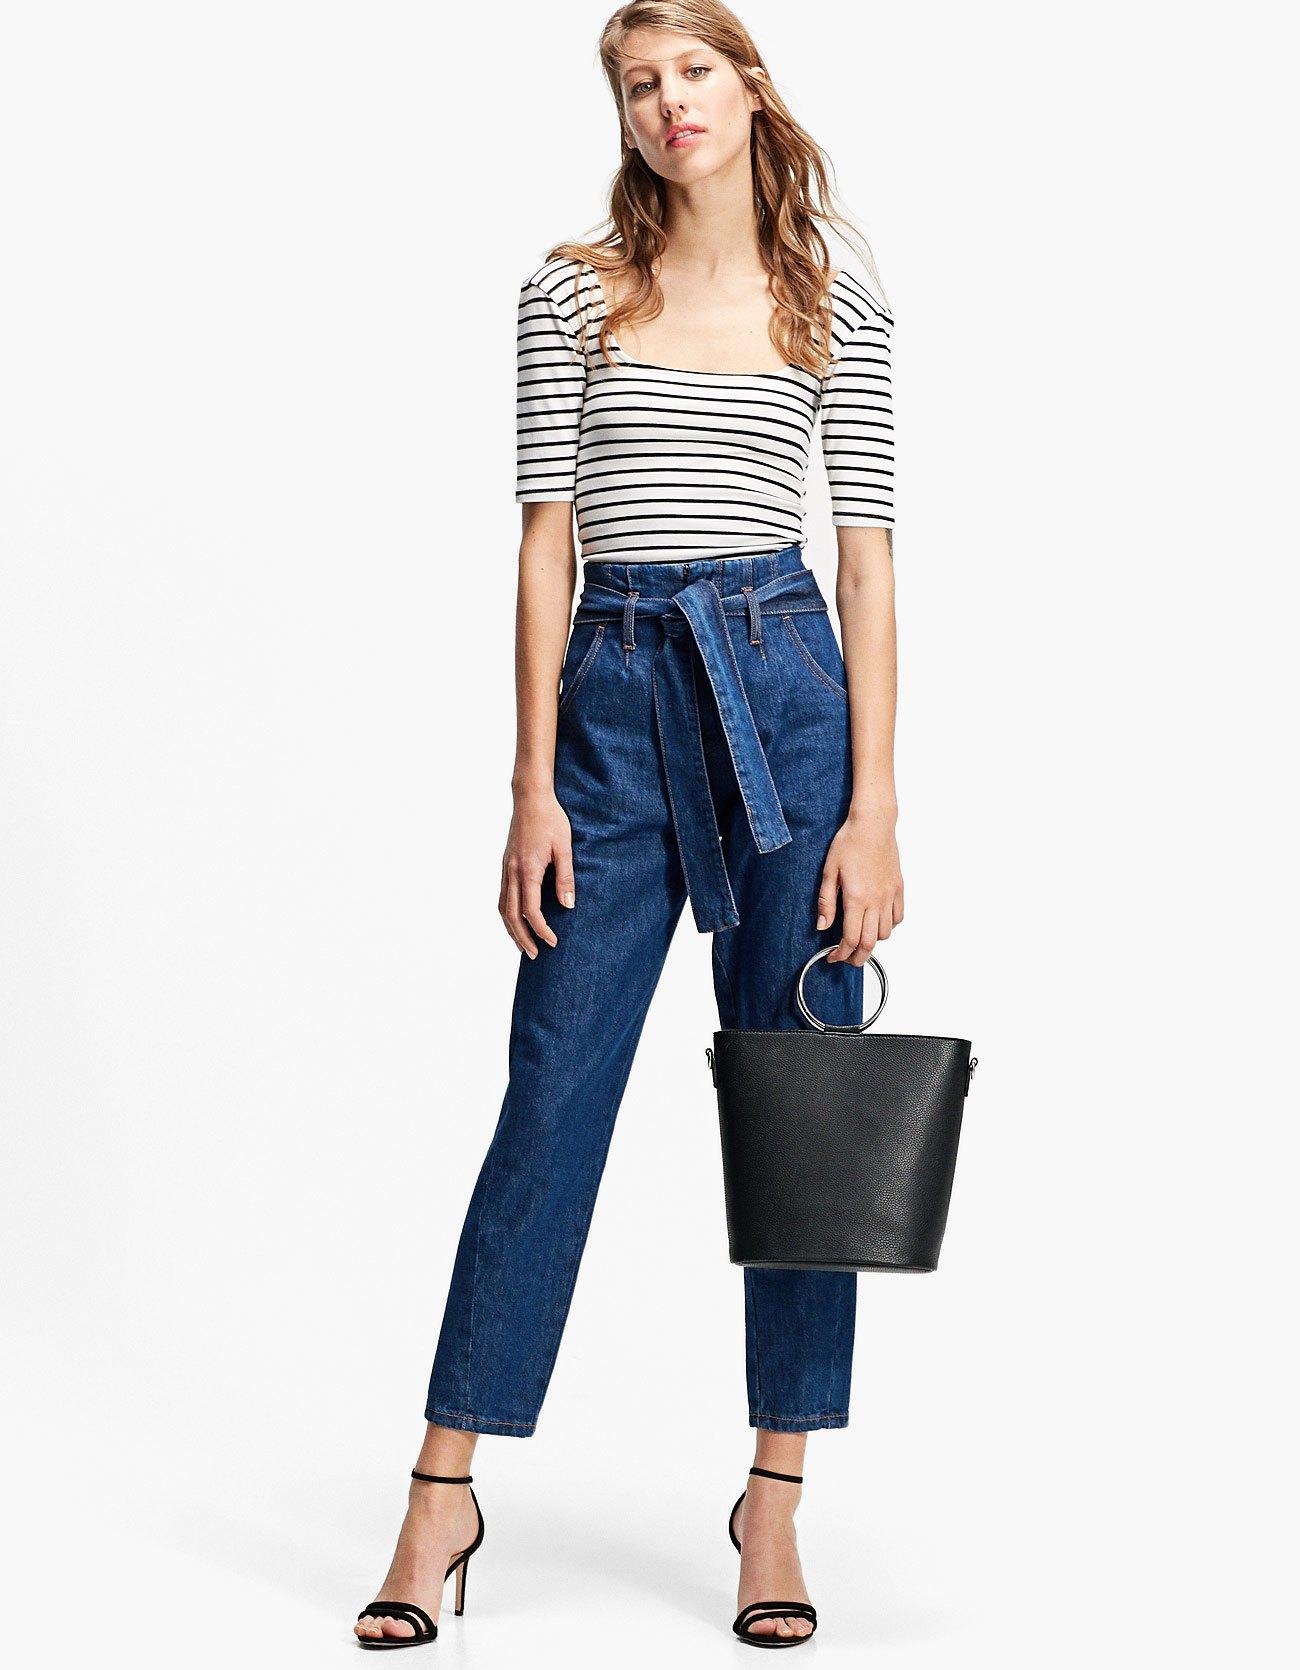 Jeans paper bag Stradivarius